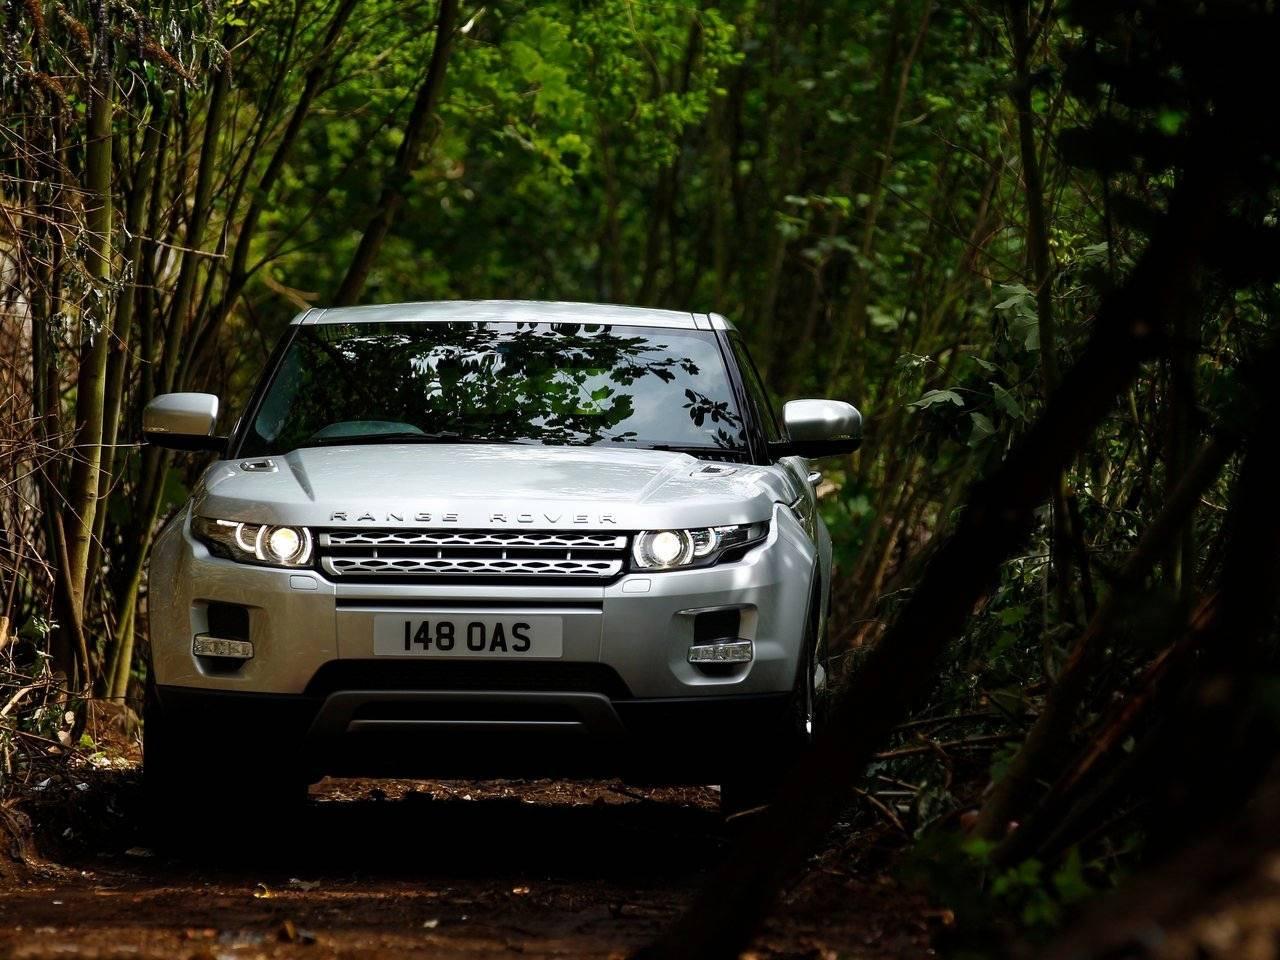 range rover evoque off road wallpapers